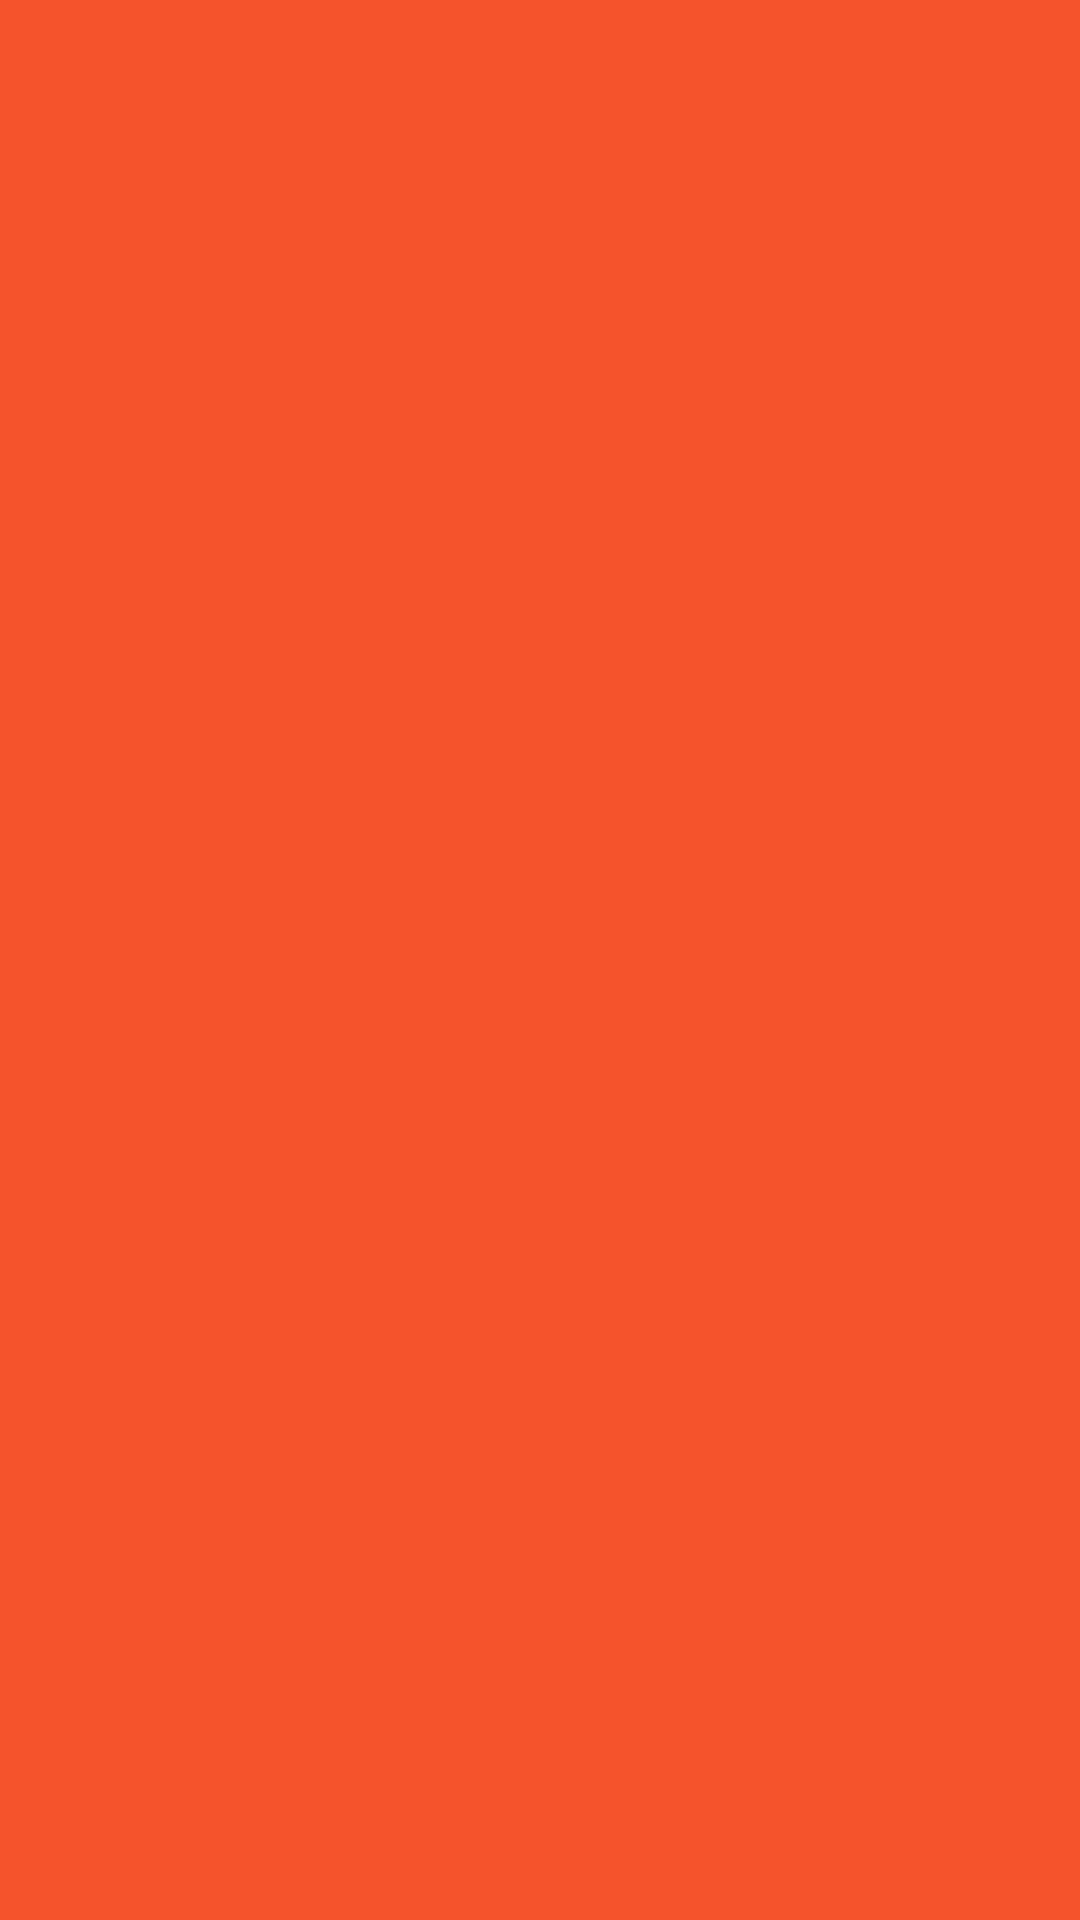 Fb solid color image lidcolorefbm